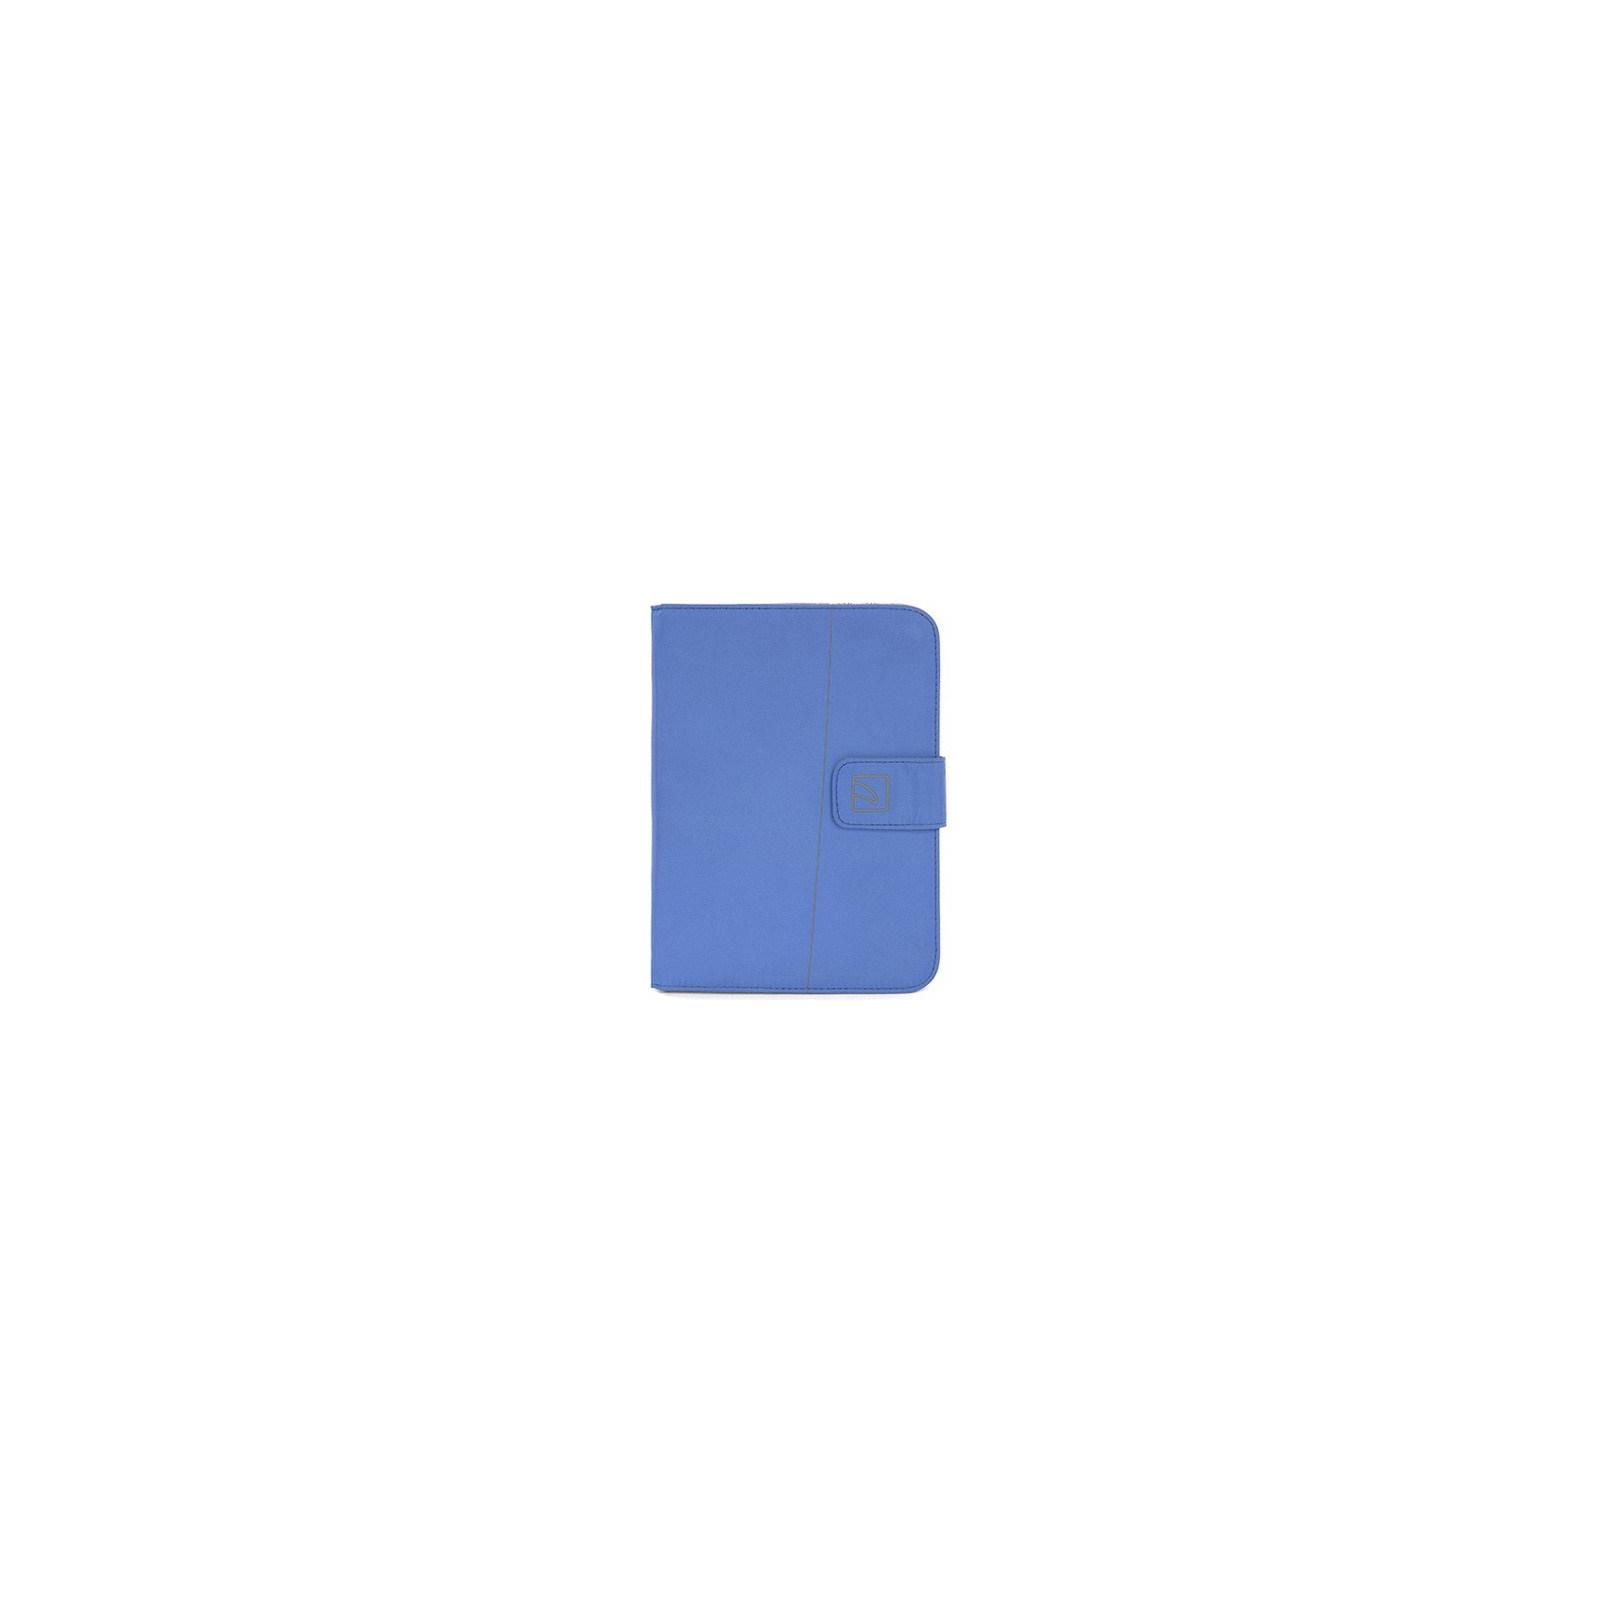 "Чехол для планшета Tucano 8"" Facile Stand Blue (TAB-FA8-B)"